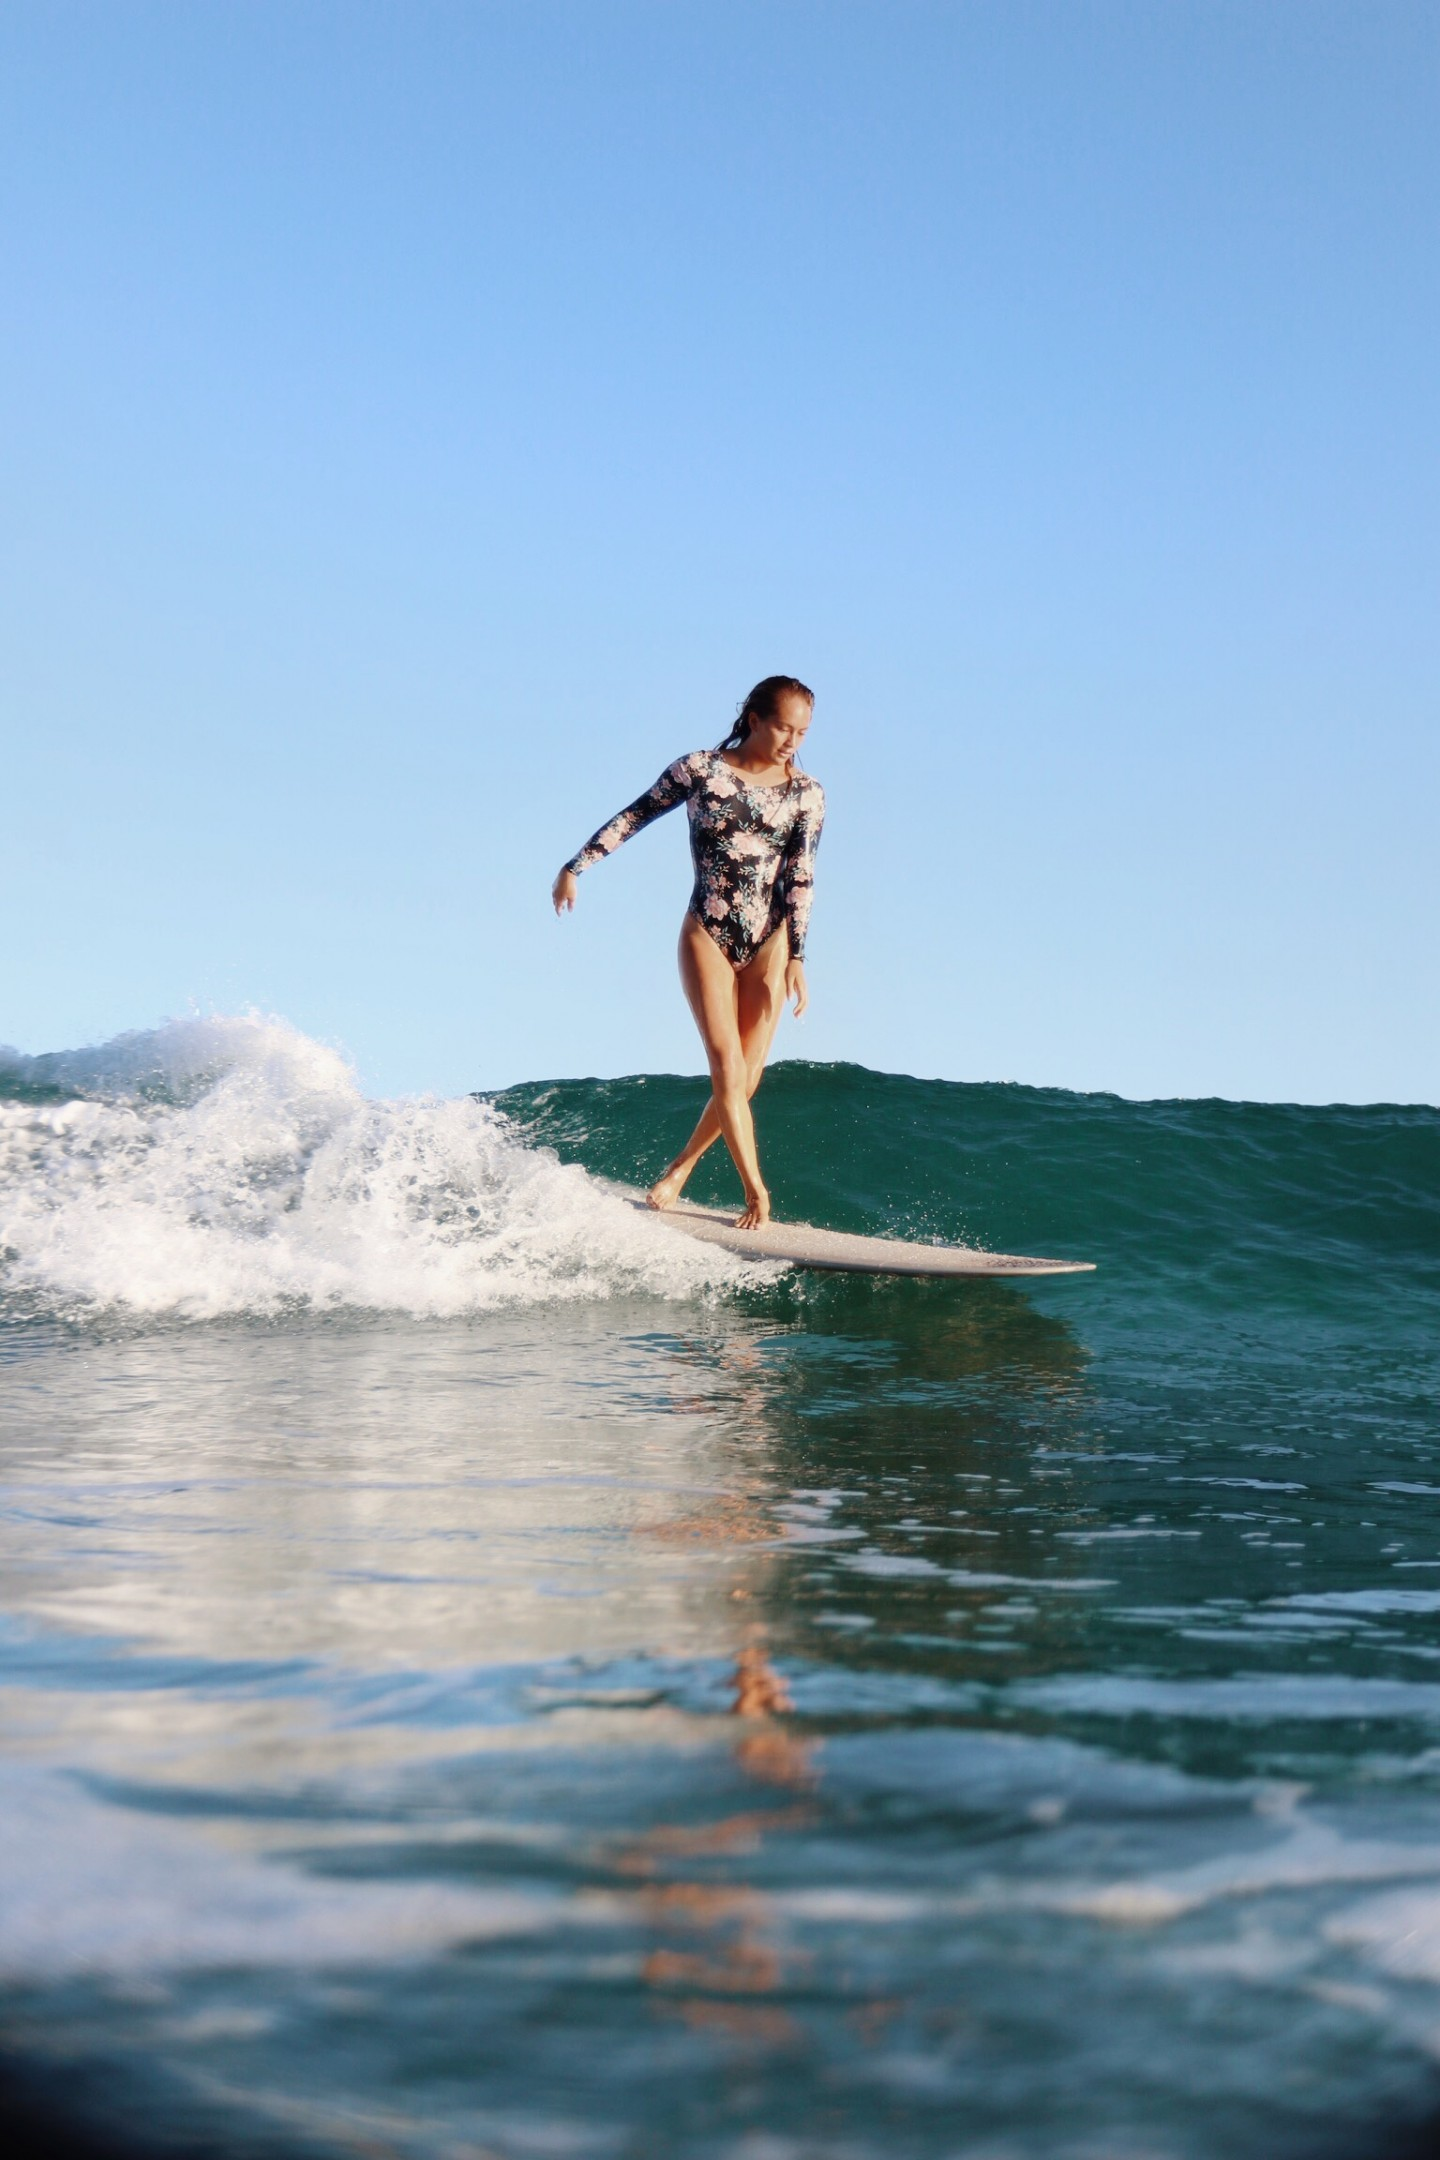 Surfer foundation